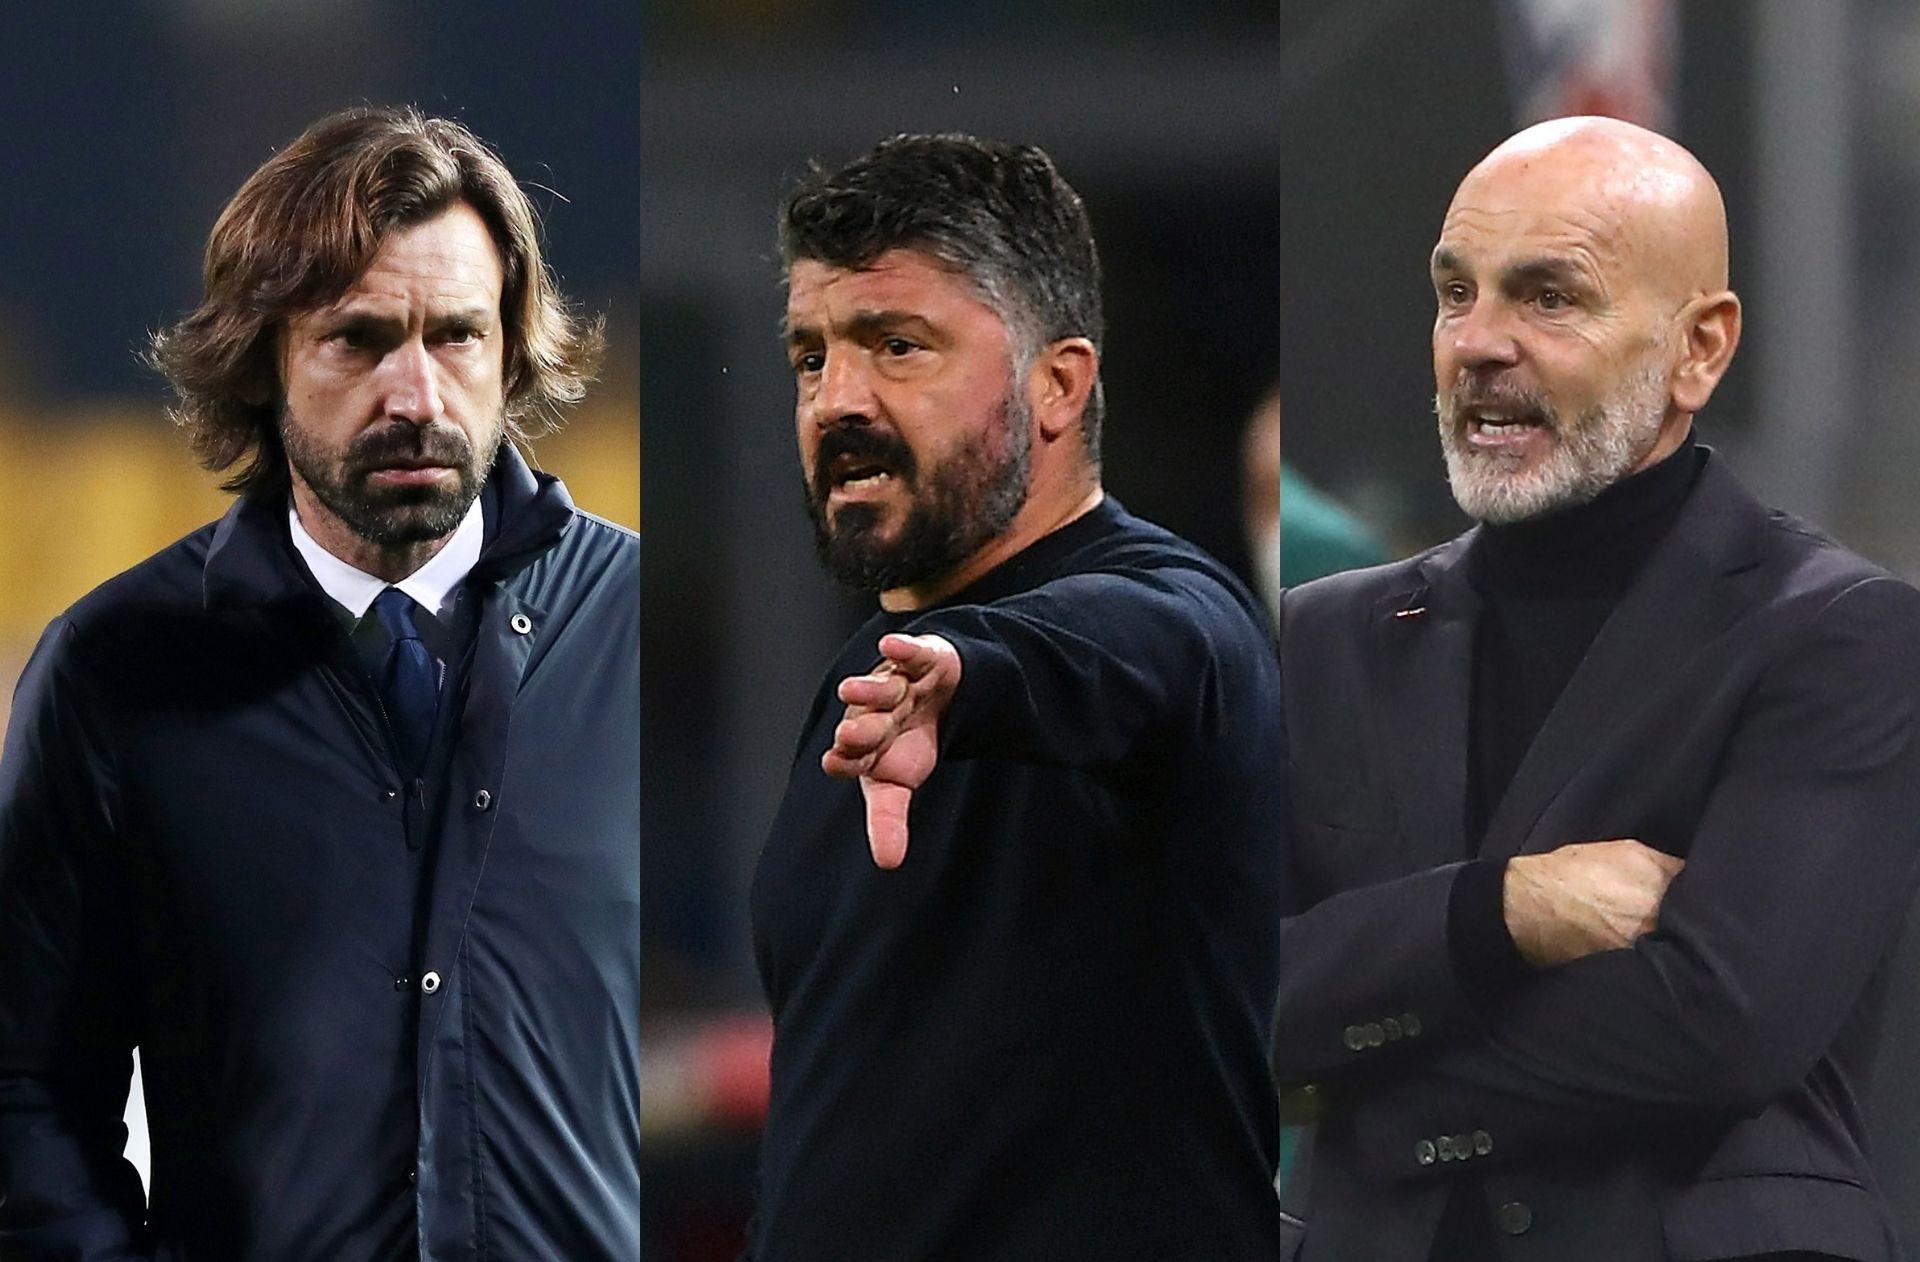 Andrea Pirlo of Juventus, Gennaro Gattuso of Napoli, Stefano Pioli of AC Milan